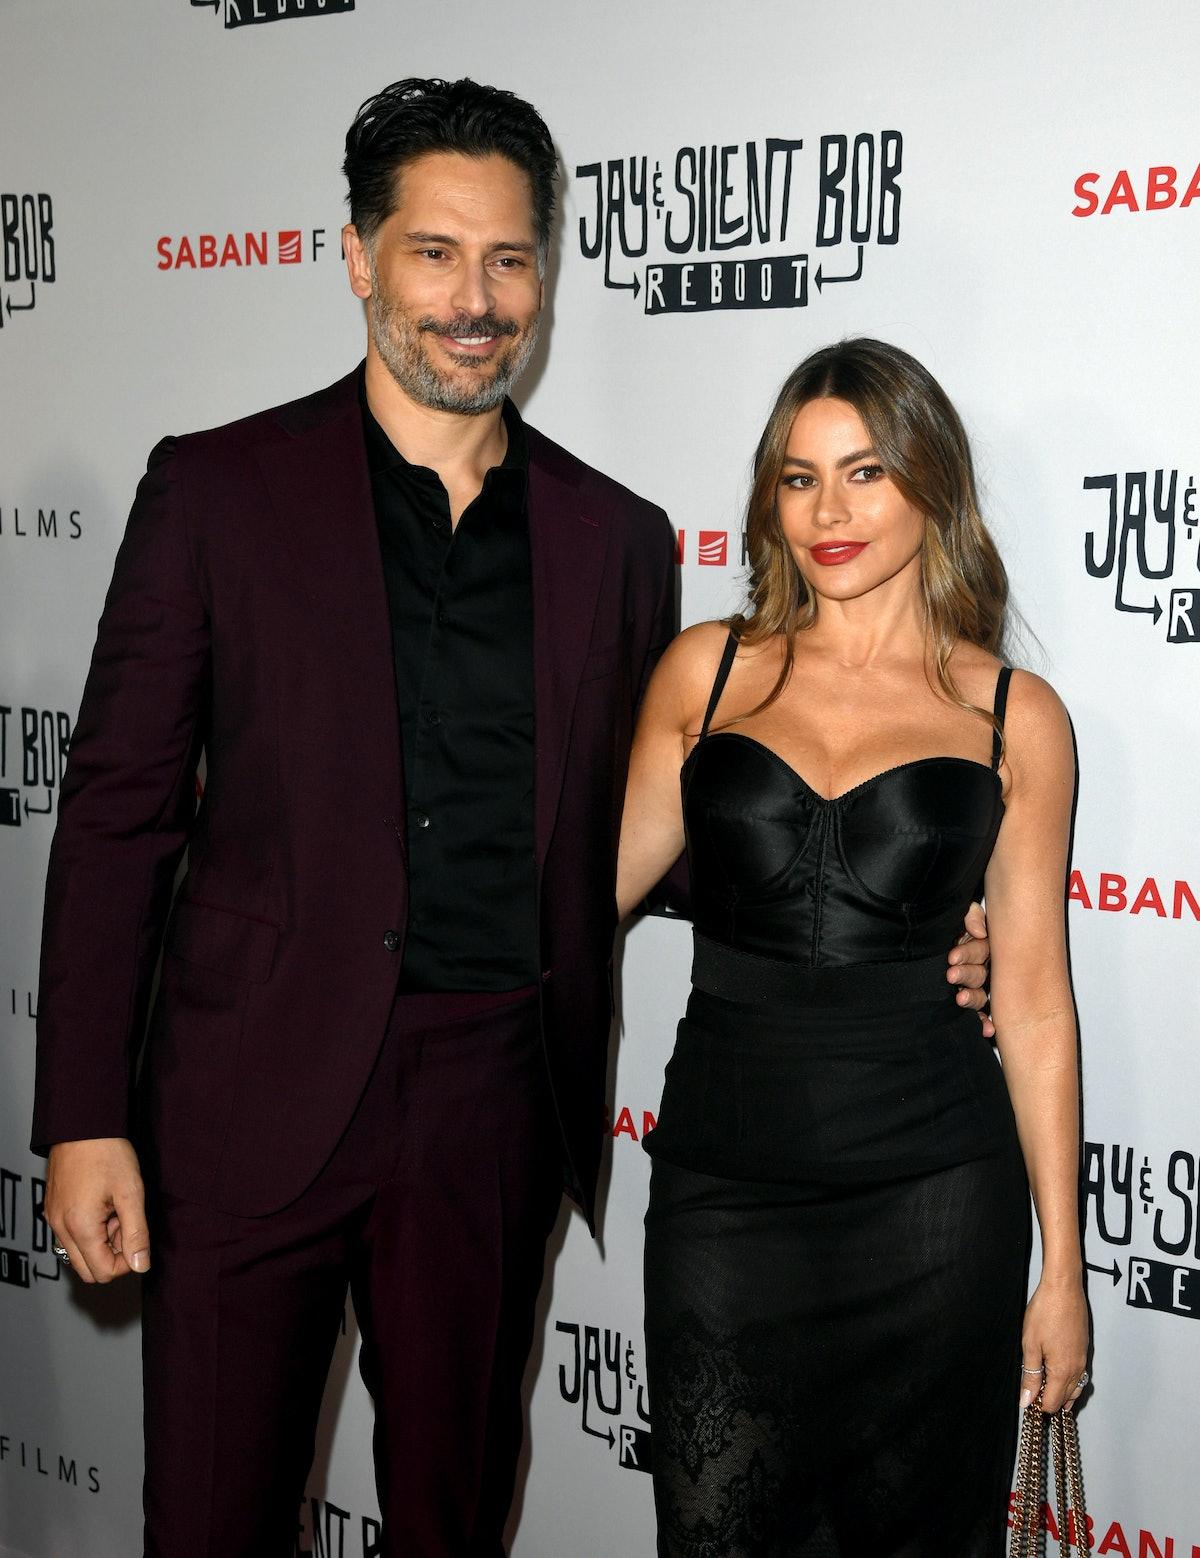 HOLLYWOOD, CALIFORNIA - OCTOBER 14: Joe Manganiello (L) and Sofia Vergara arrive at the premiere of ...